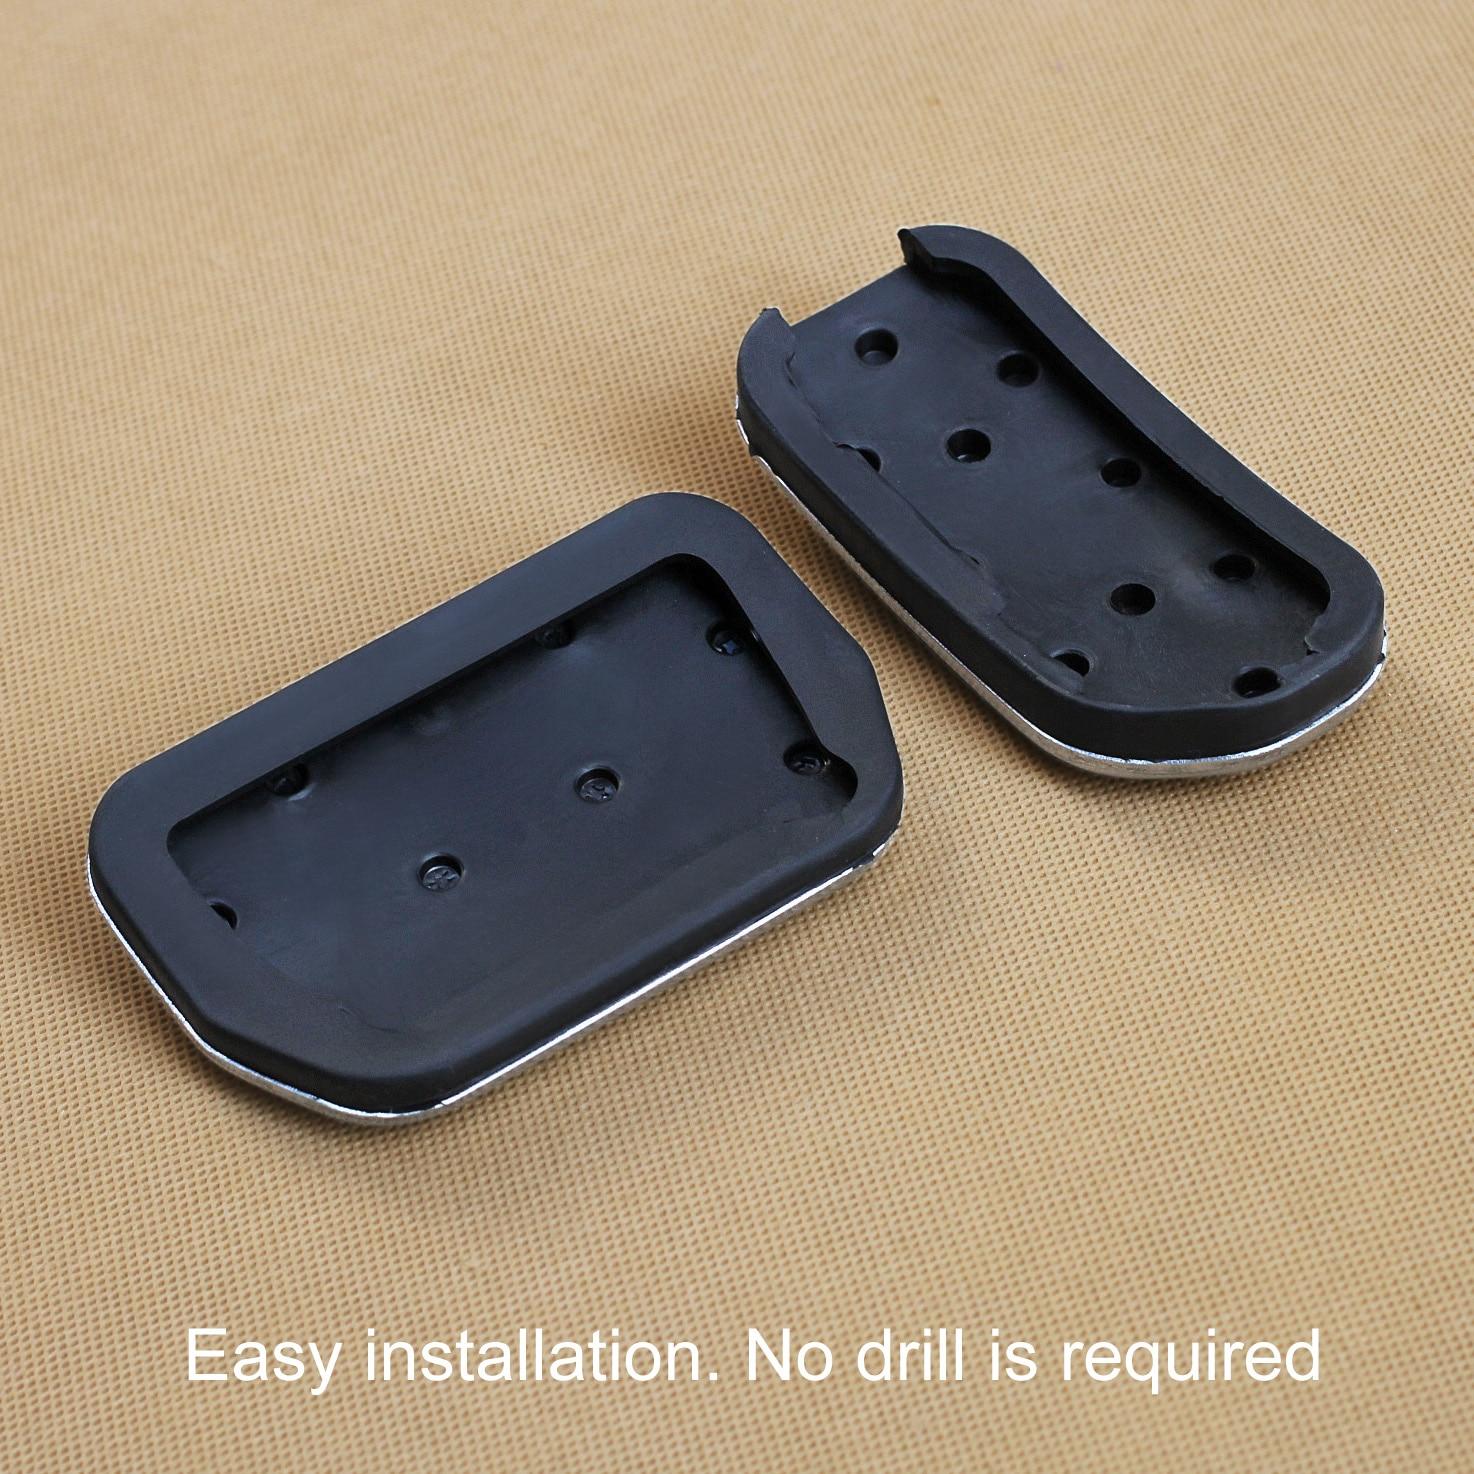 2Pcs//Set Stainless Steel Car Non-Slip Gas Brake Pedal For Toyota RAV4 Lexus NX